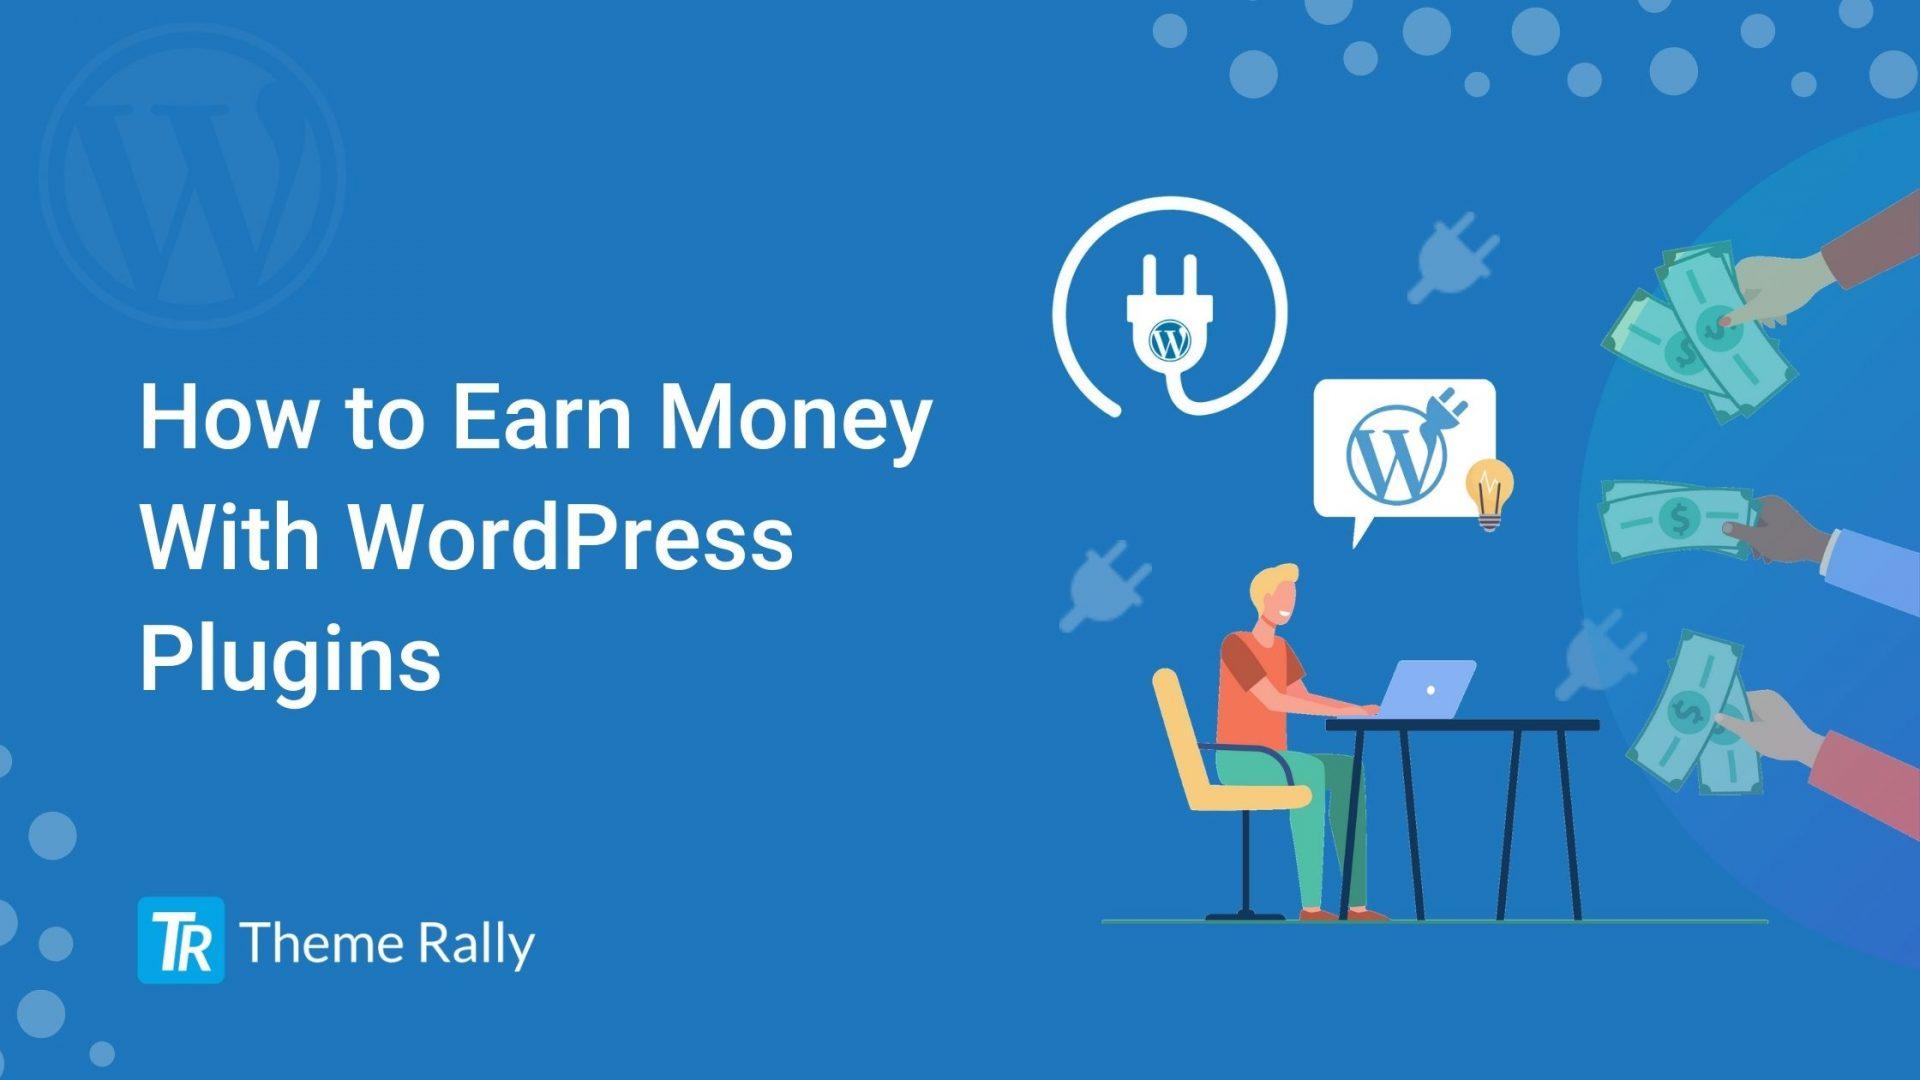 How to Earn Money With WordPress Plugins